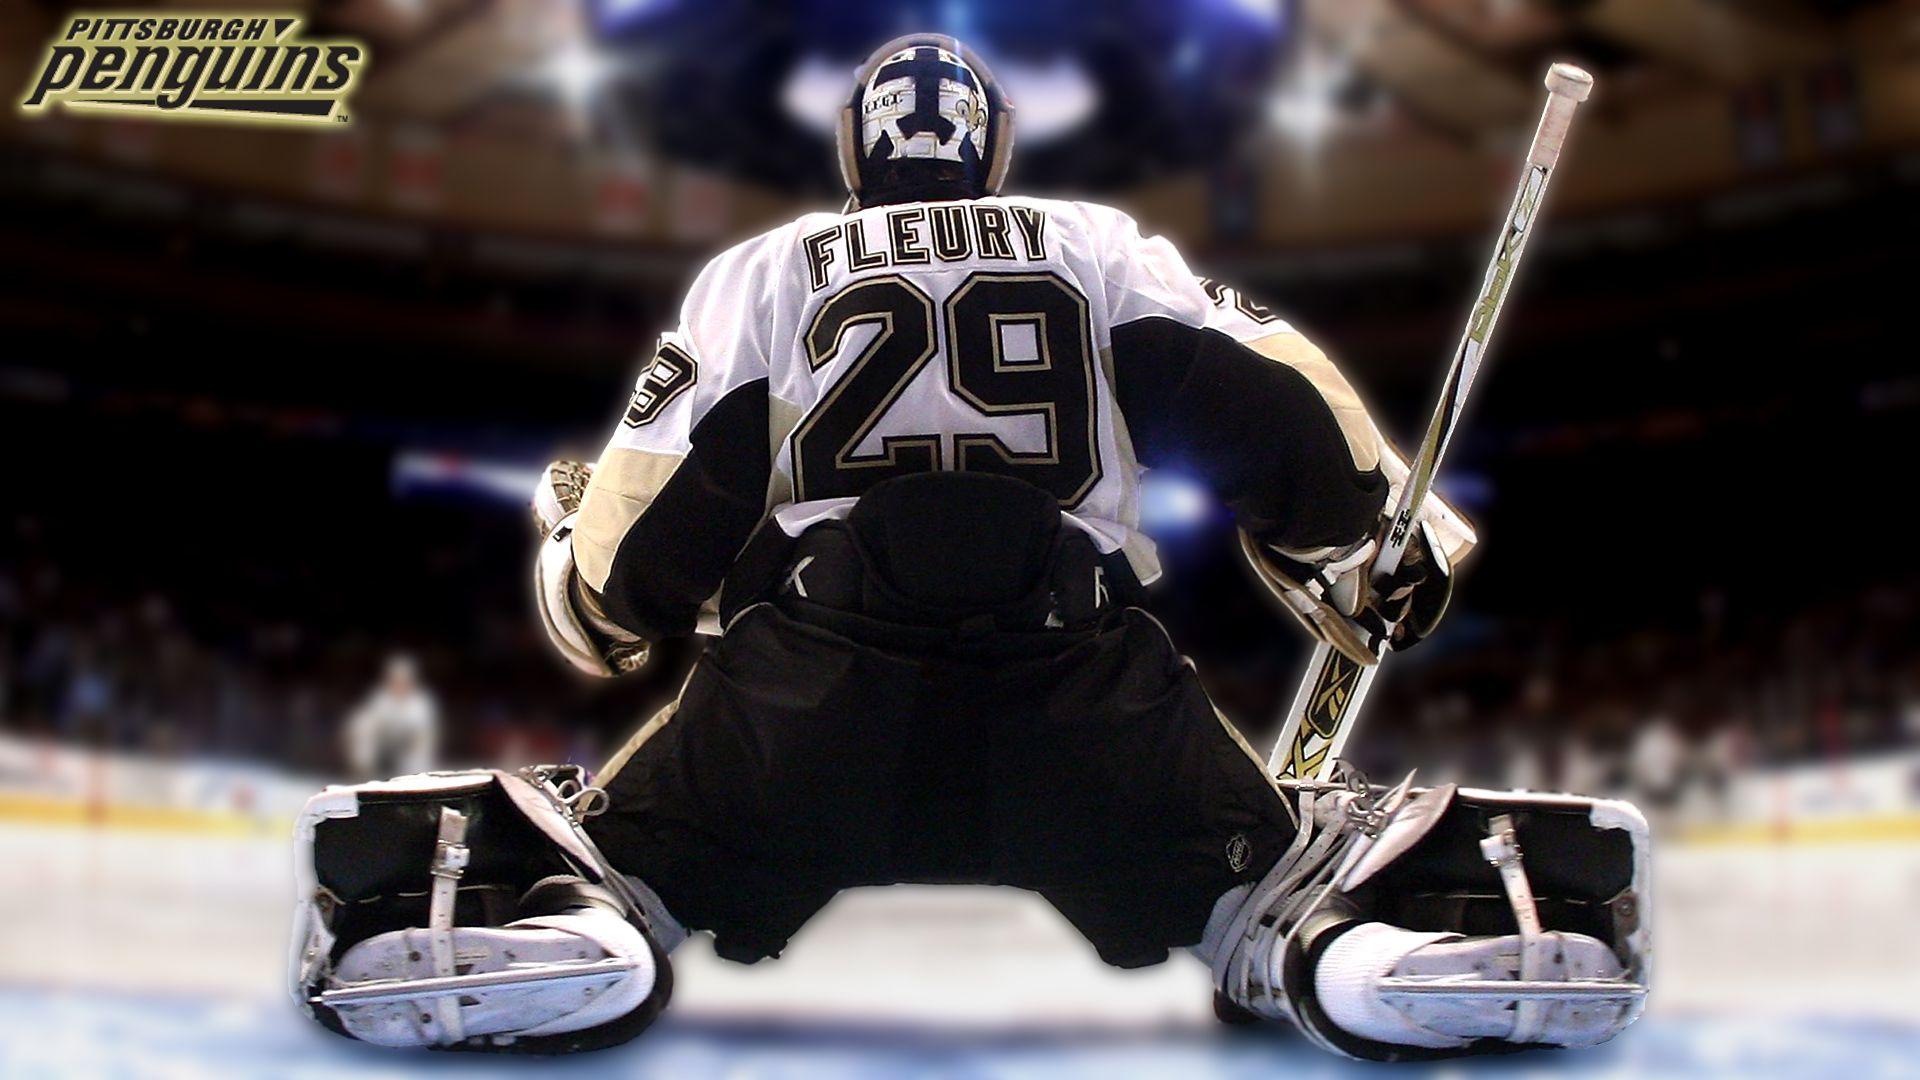 Marc Andre Fleury Athletes Pittsburgh penguins hockey 1920x1080